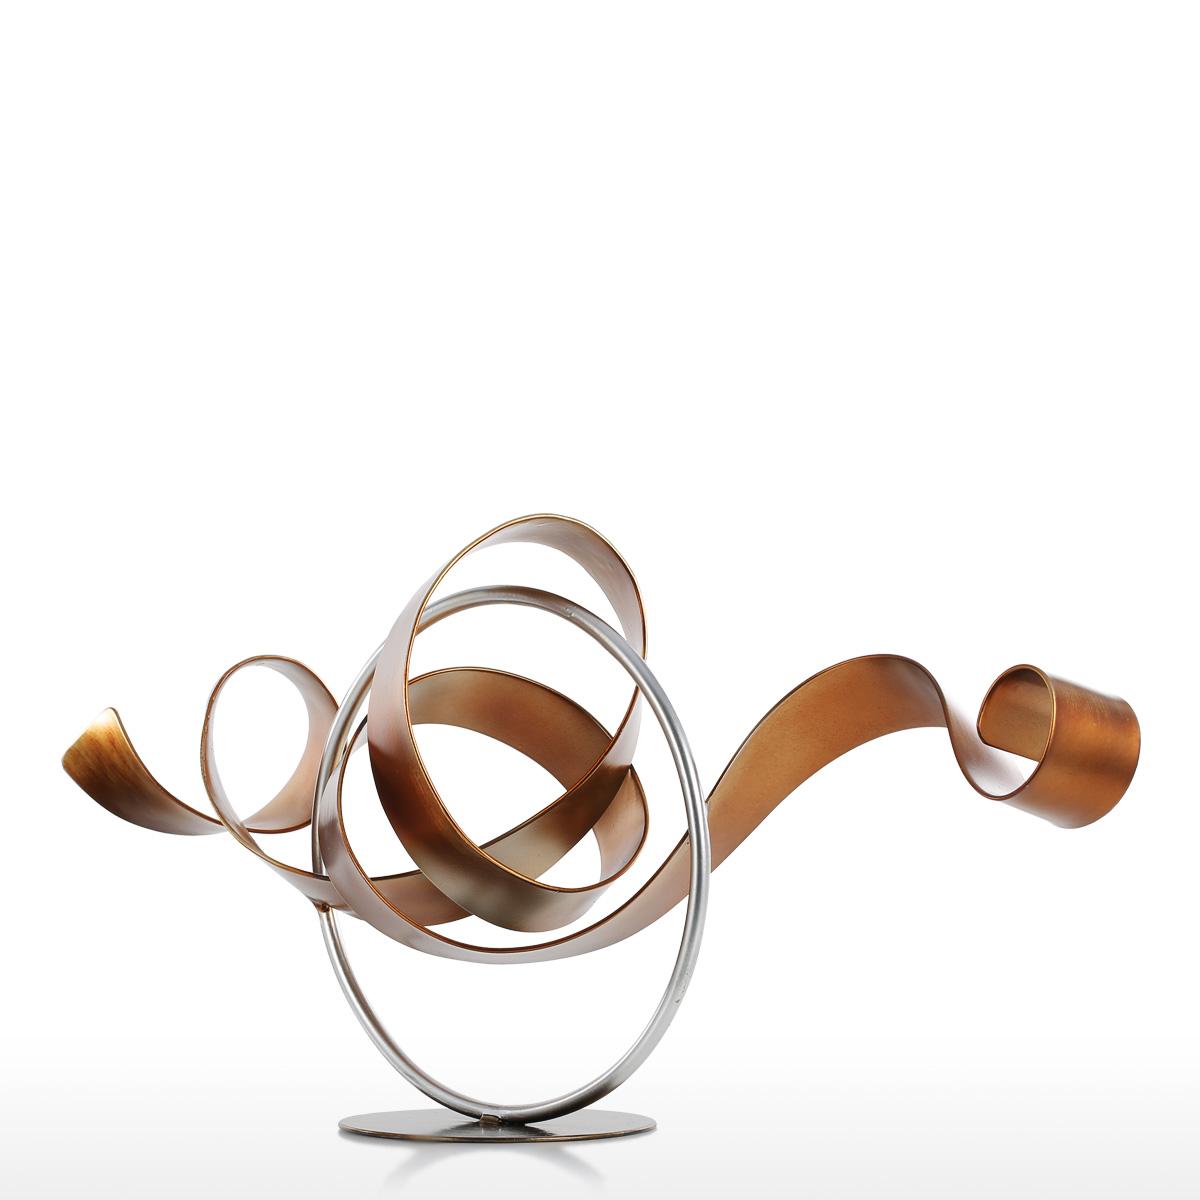 Home Decor Warehouse Sale Best And Cheap Golden Tooarts Wriggle Modern Sculpture